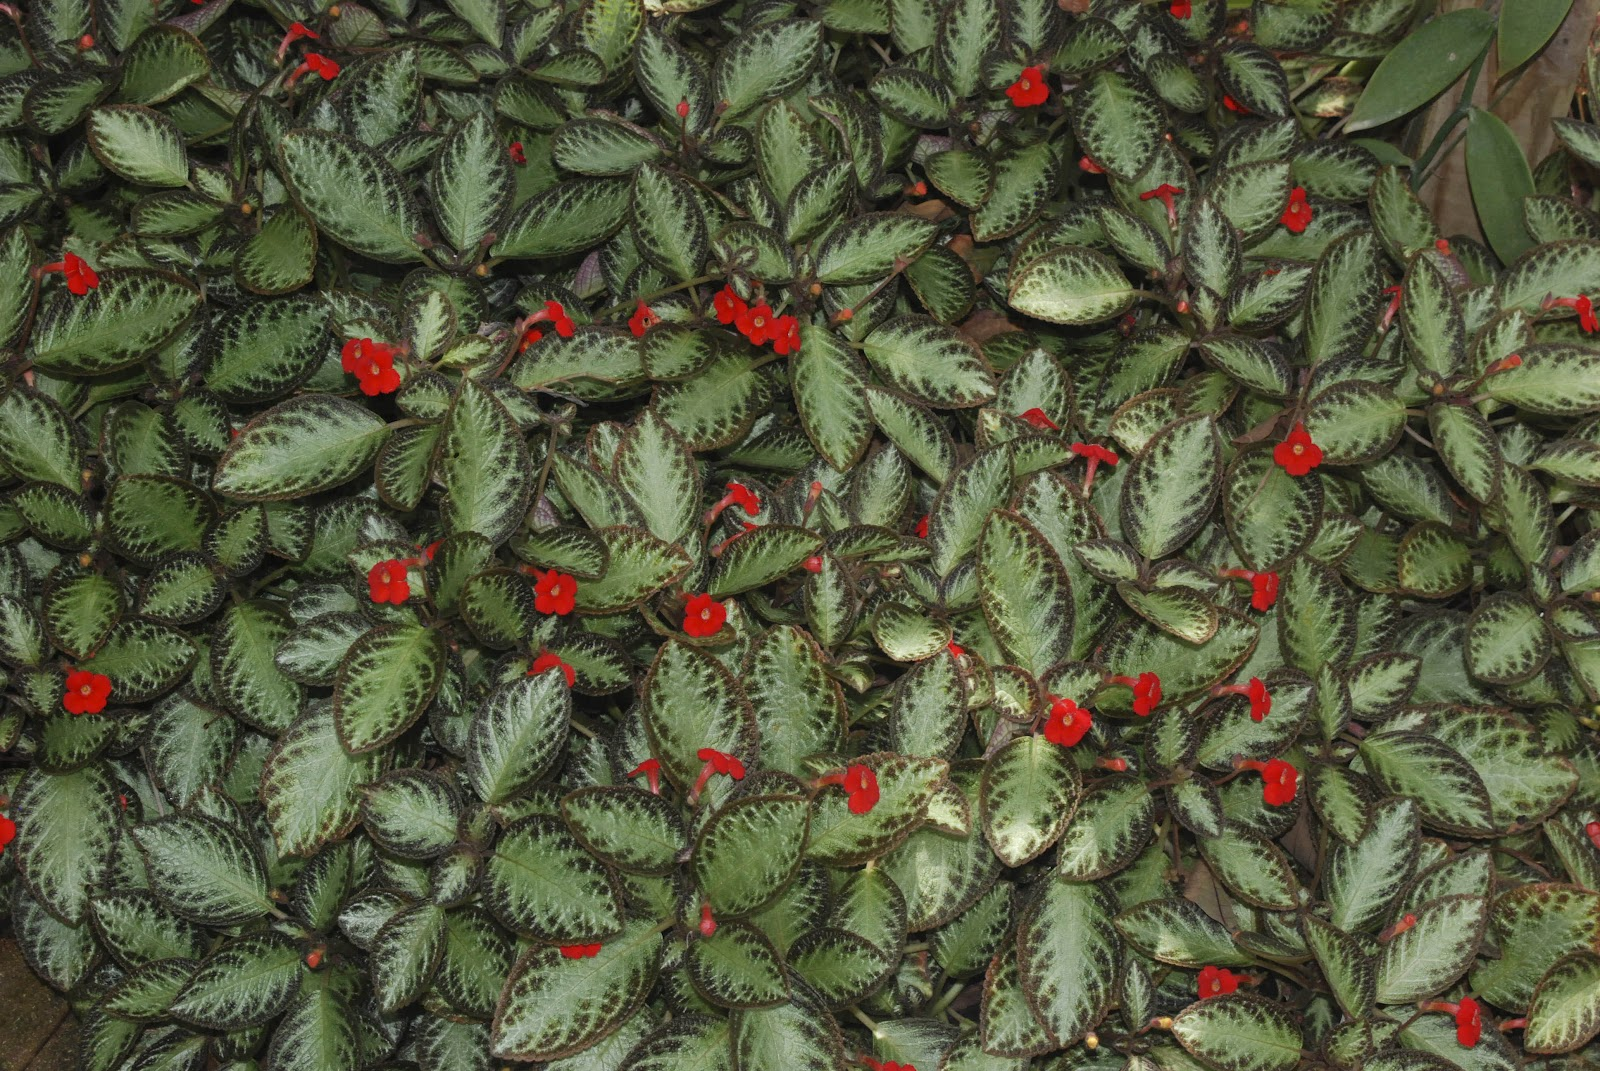 Tropical flowering plants fairchild botanic garden located